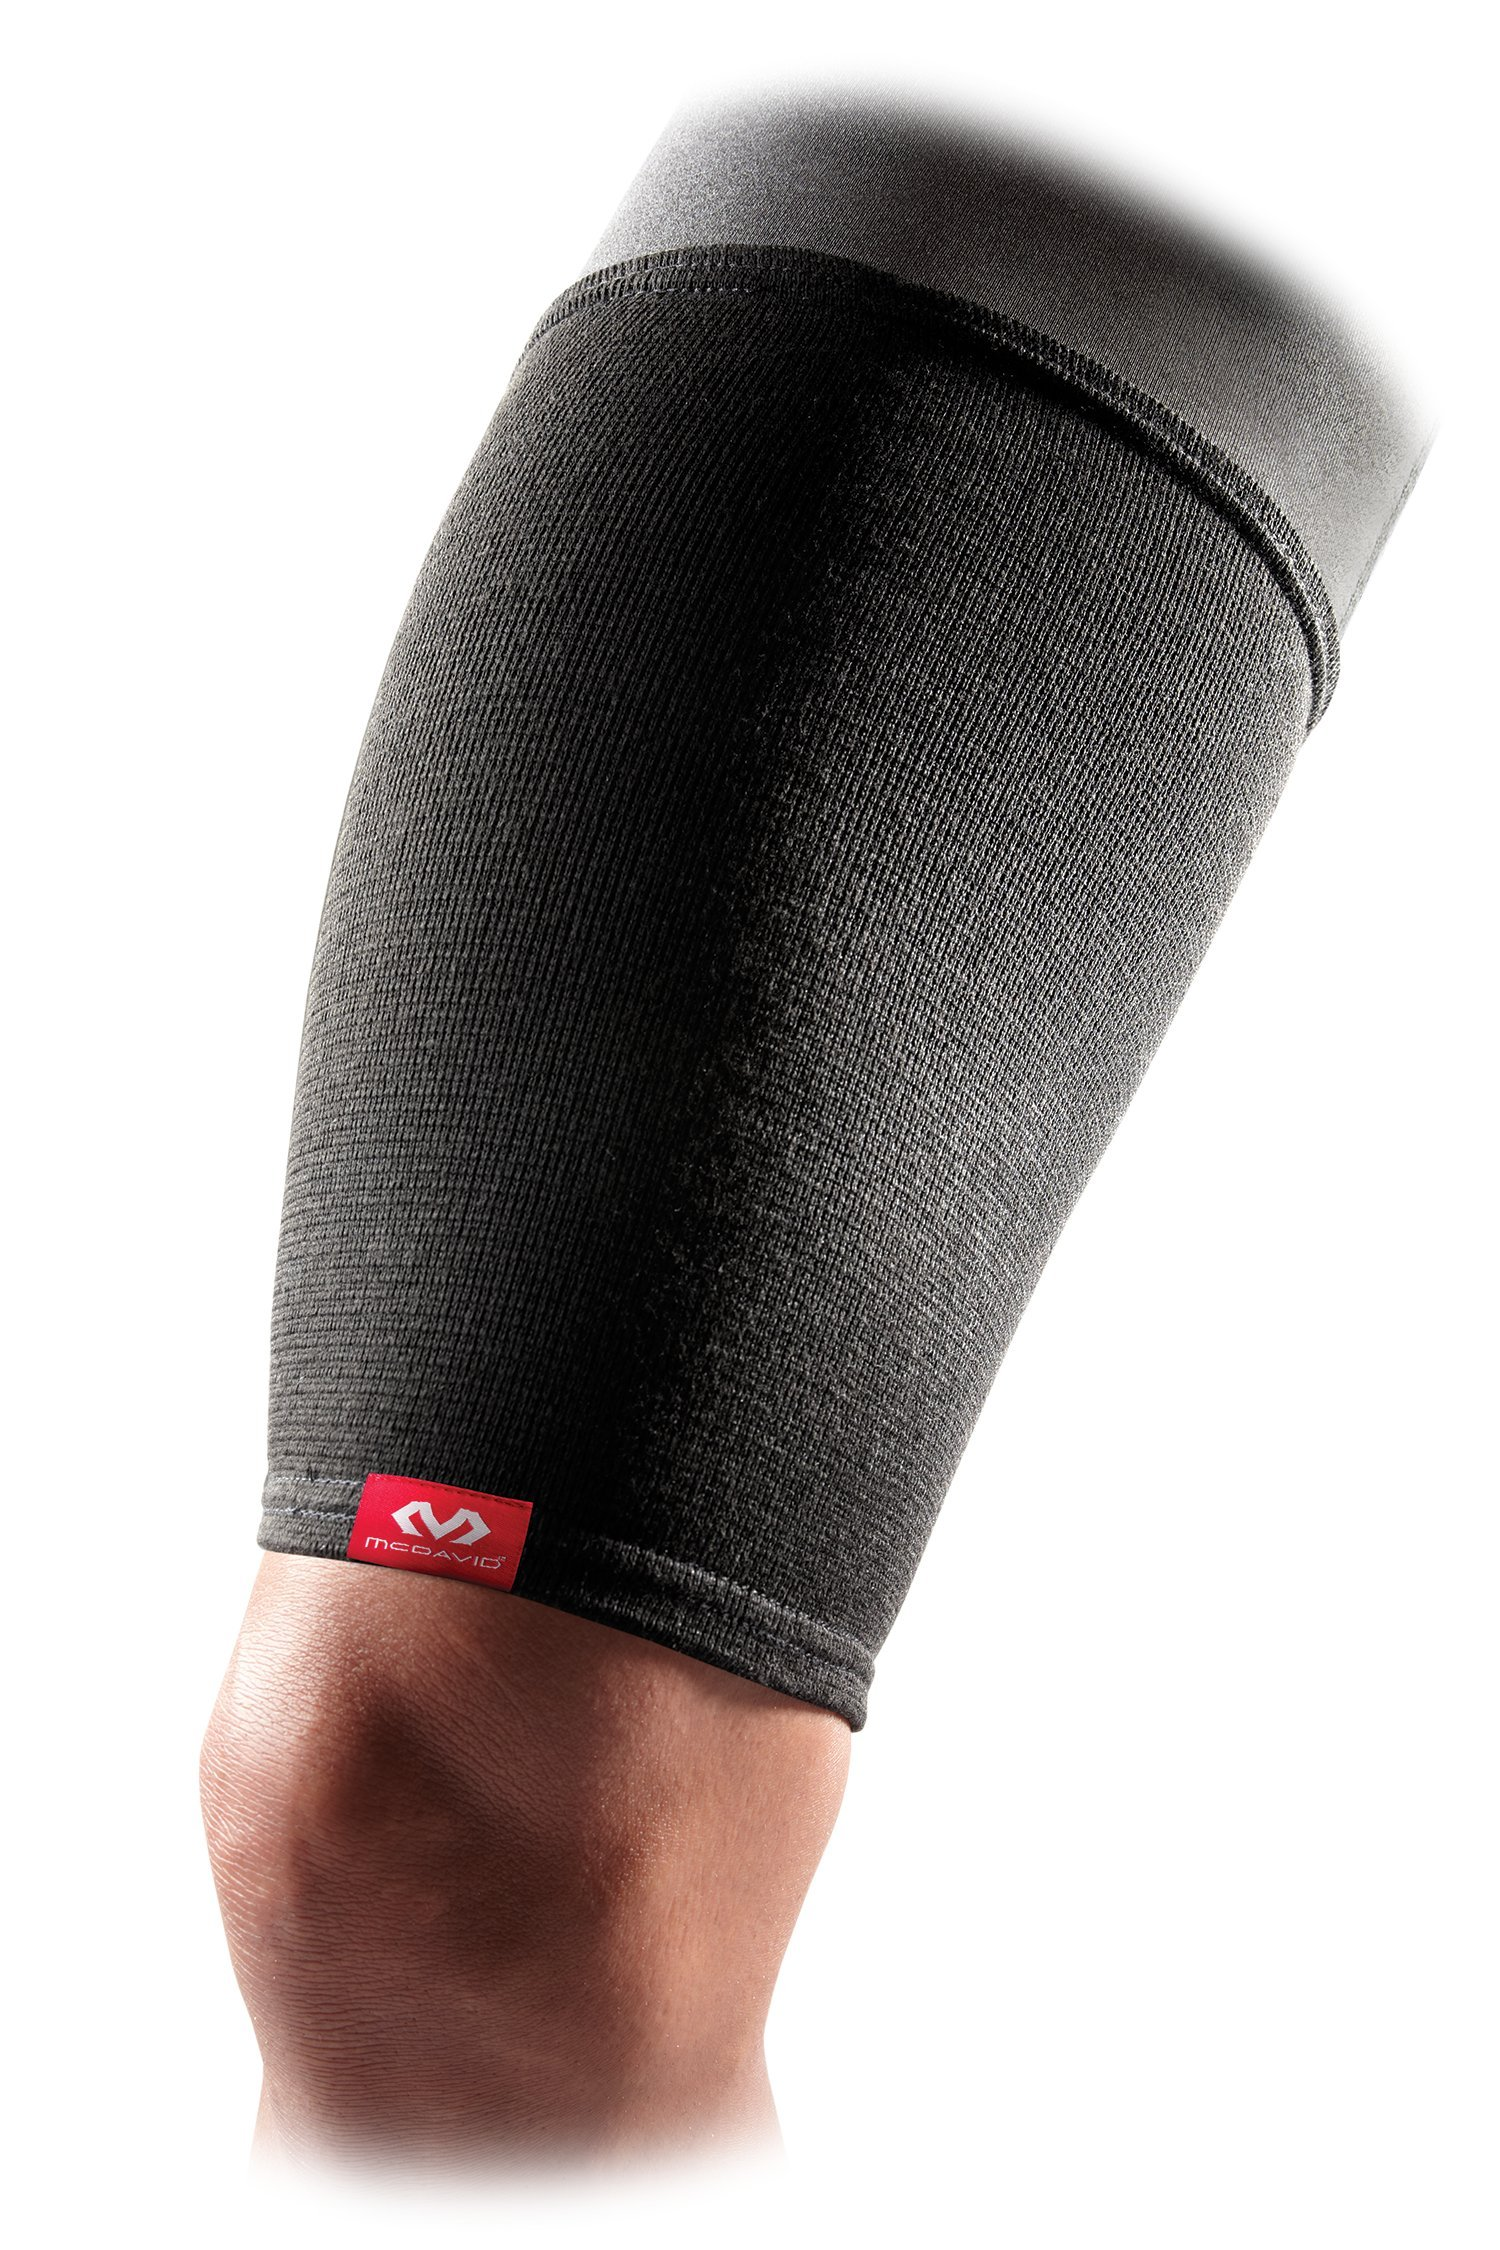 McDavid 514R Level 1 Elastic Thigh Sleeve, Black, Small